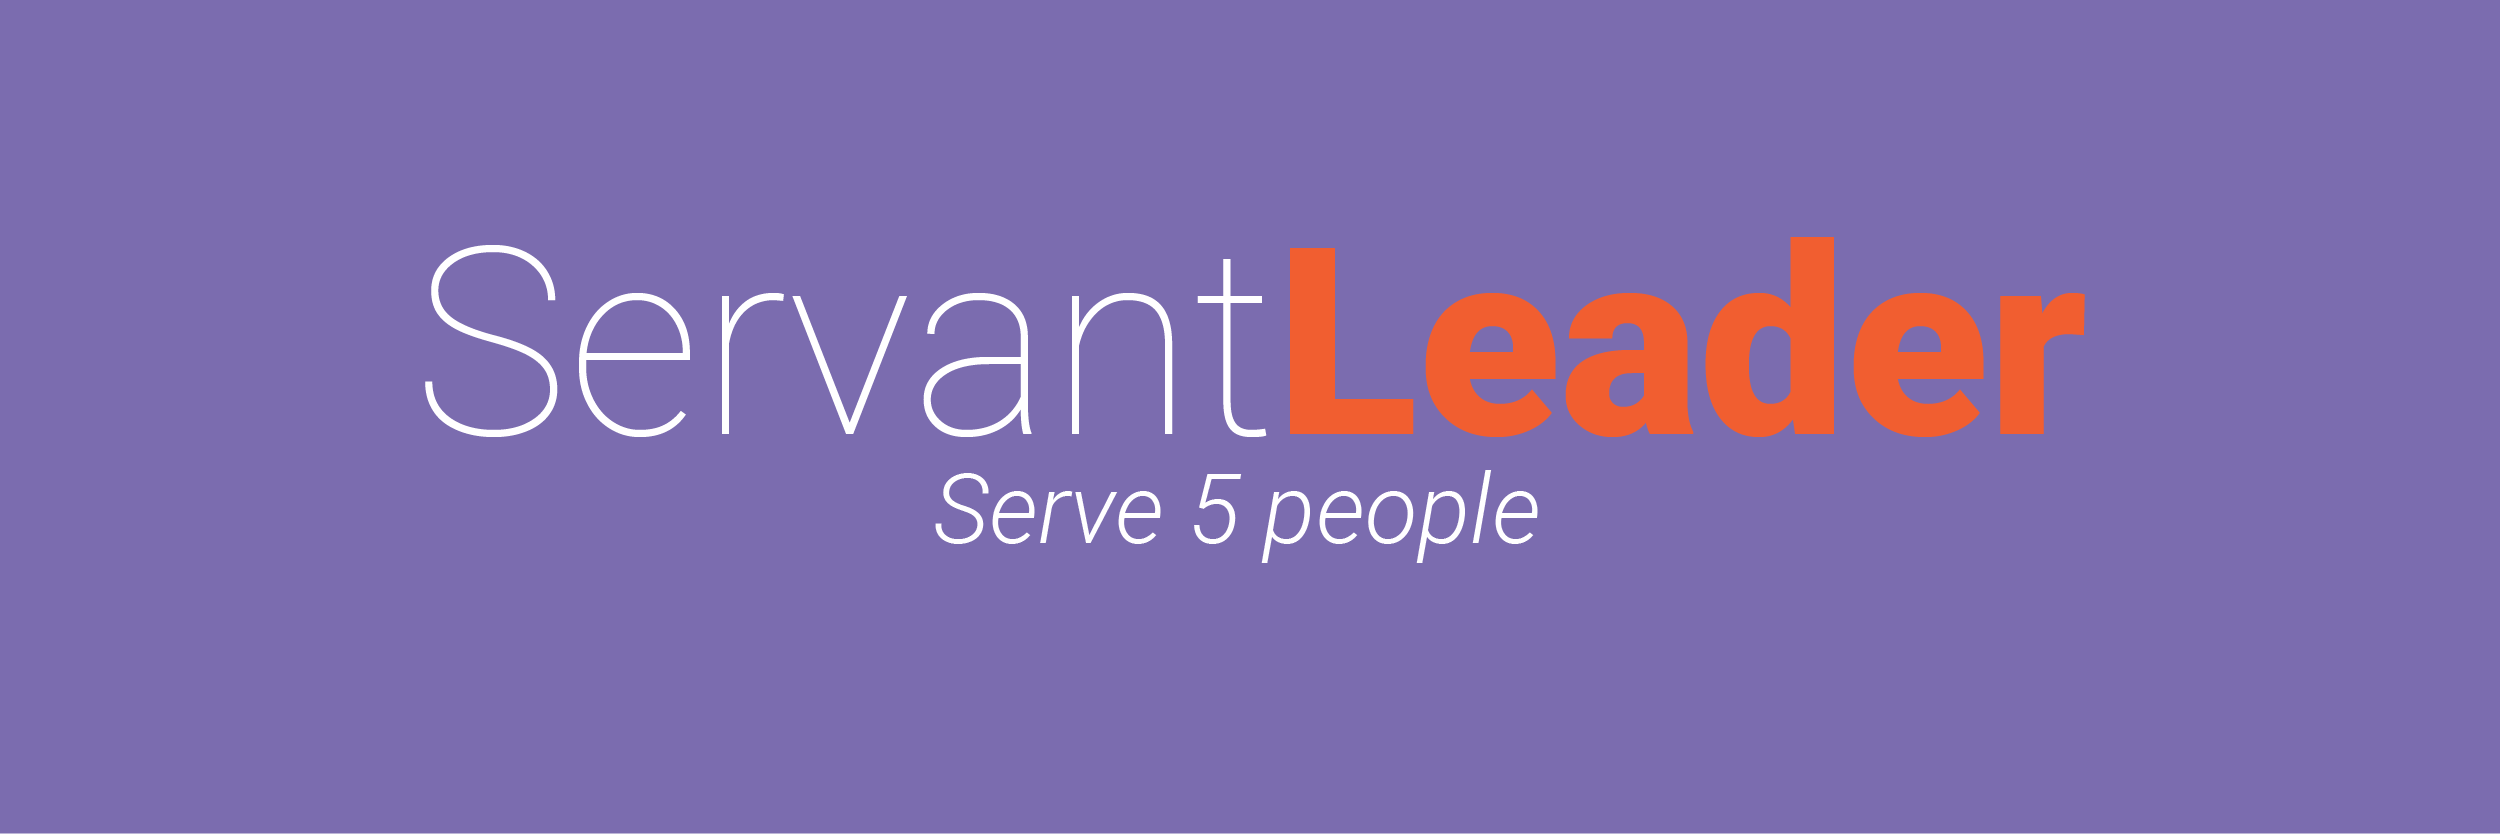 Servant Leader-01